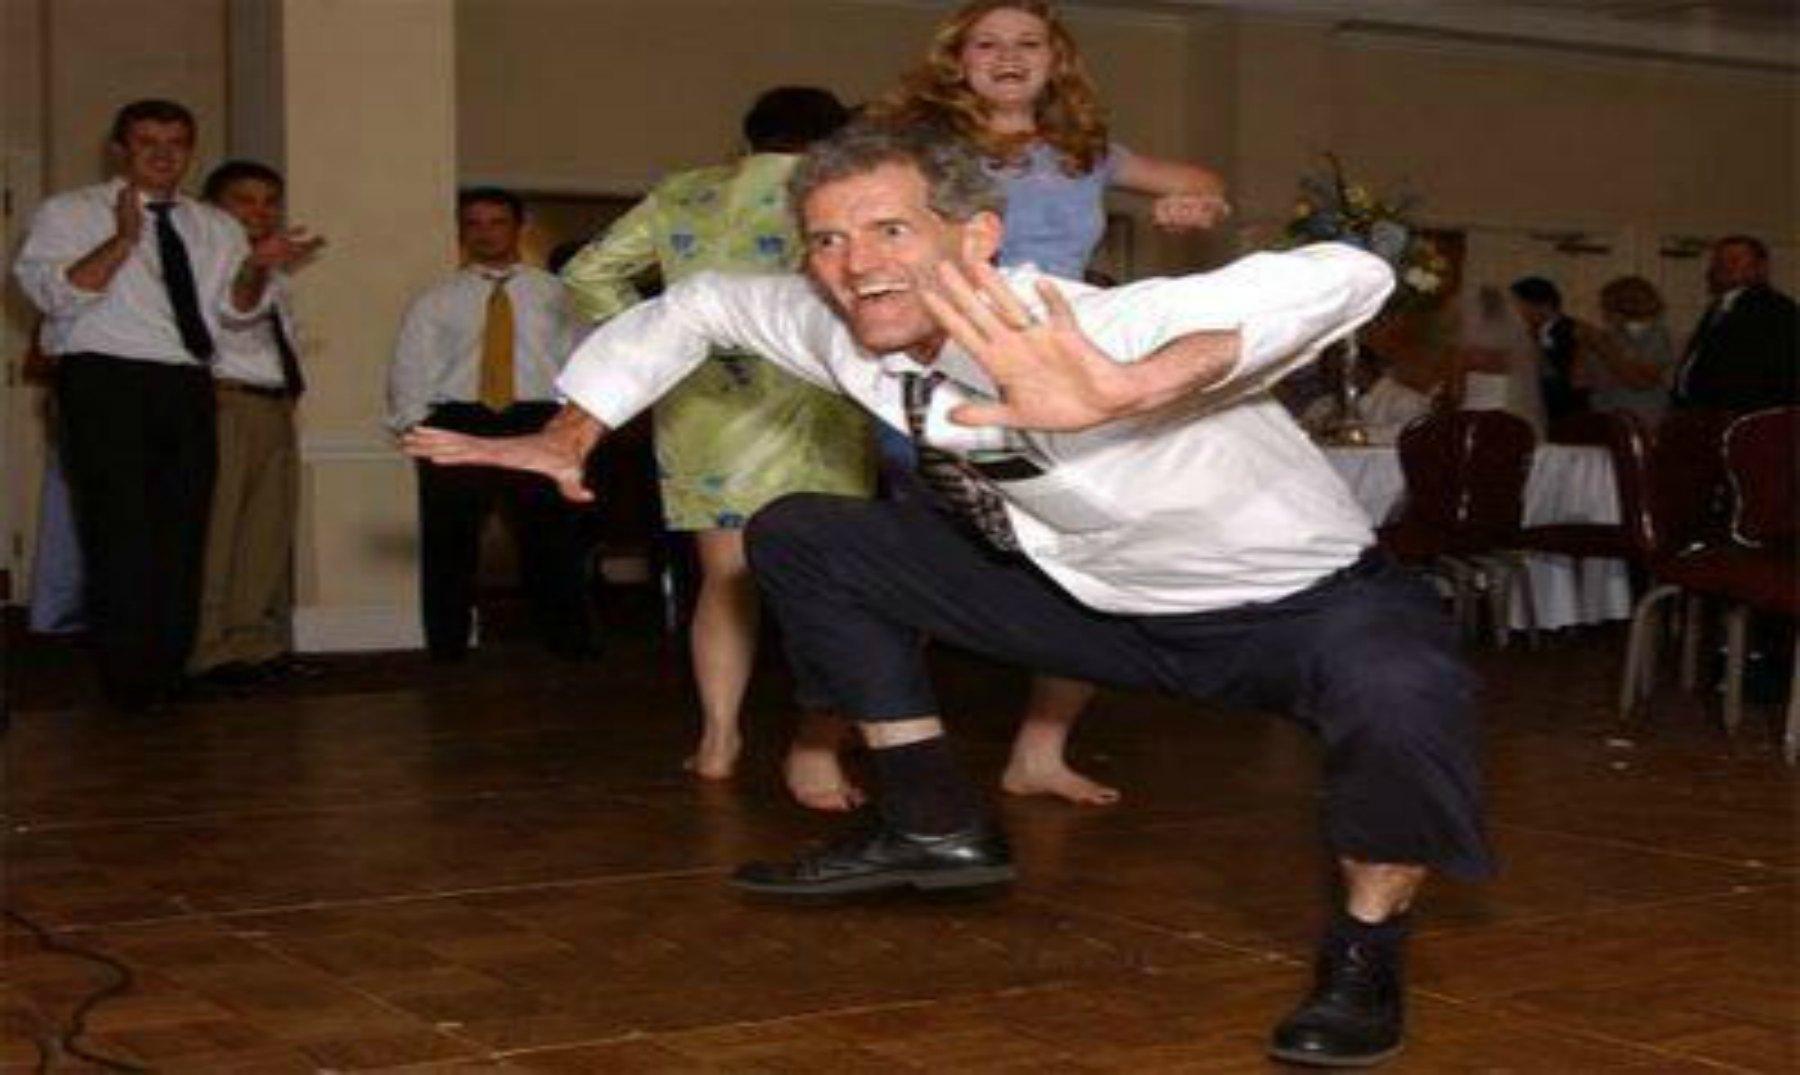 Asi me gusta bailar sobre una pija - 1 part 4